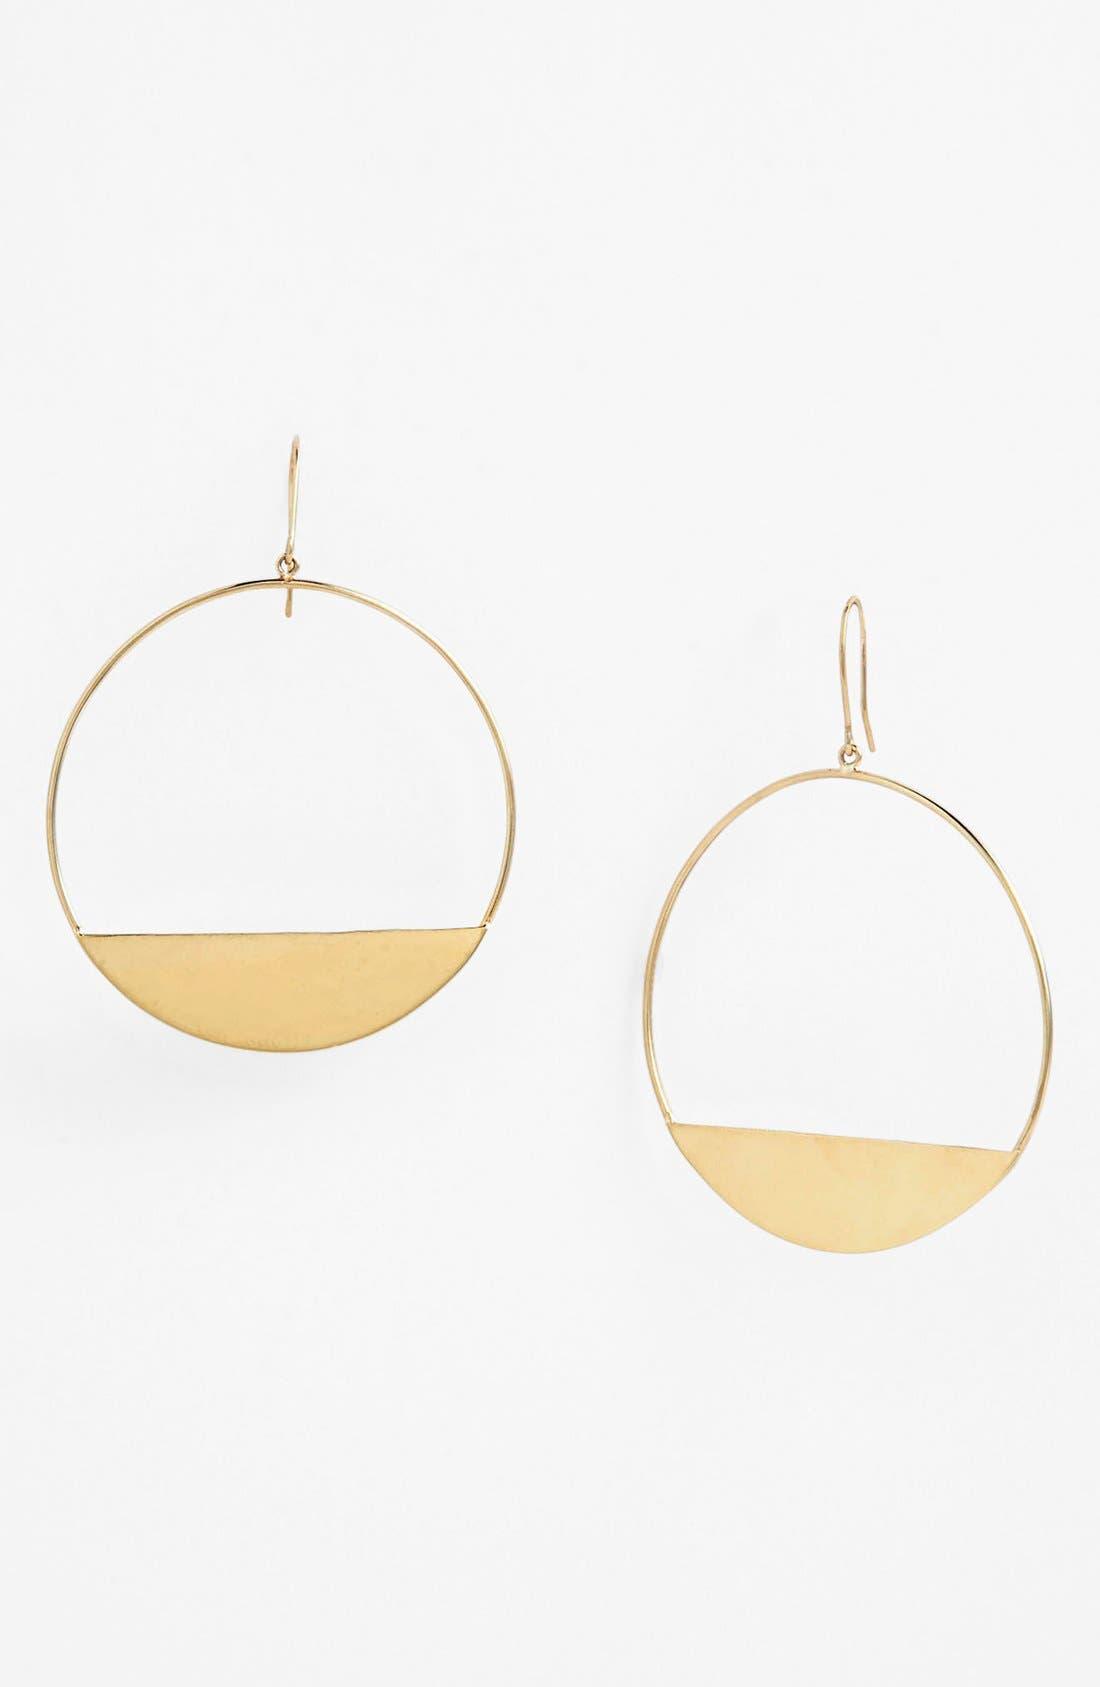 Alternate Image 1 Selected - Lana Jewelry Medium Eclipse Earrings